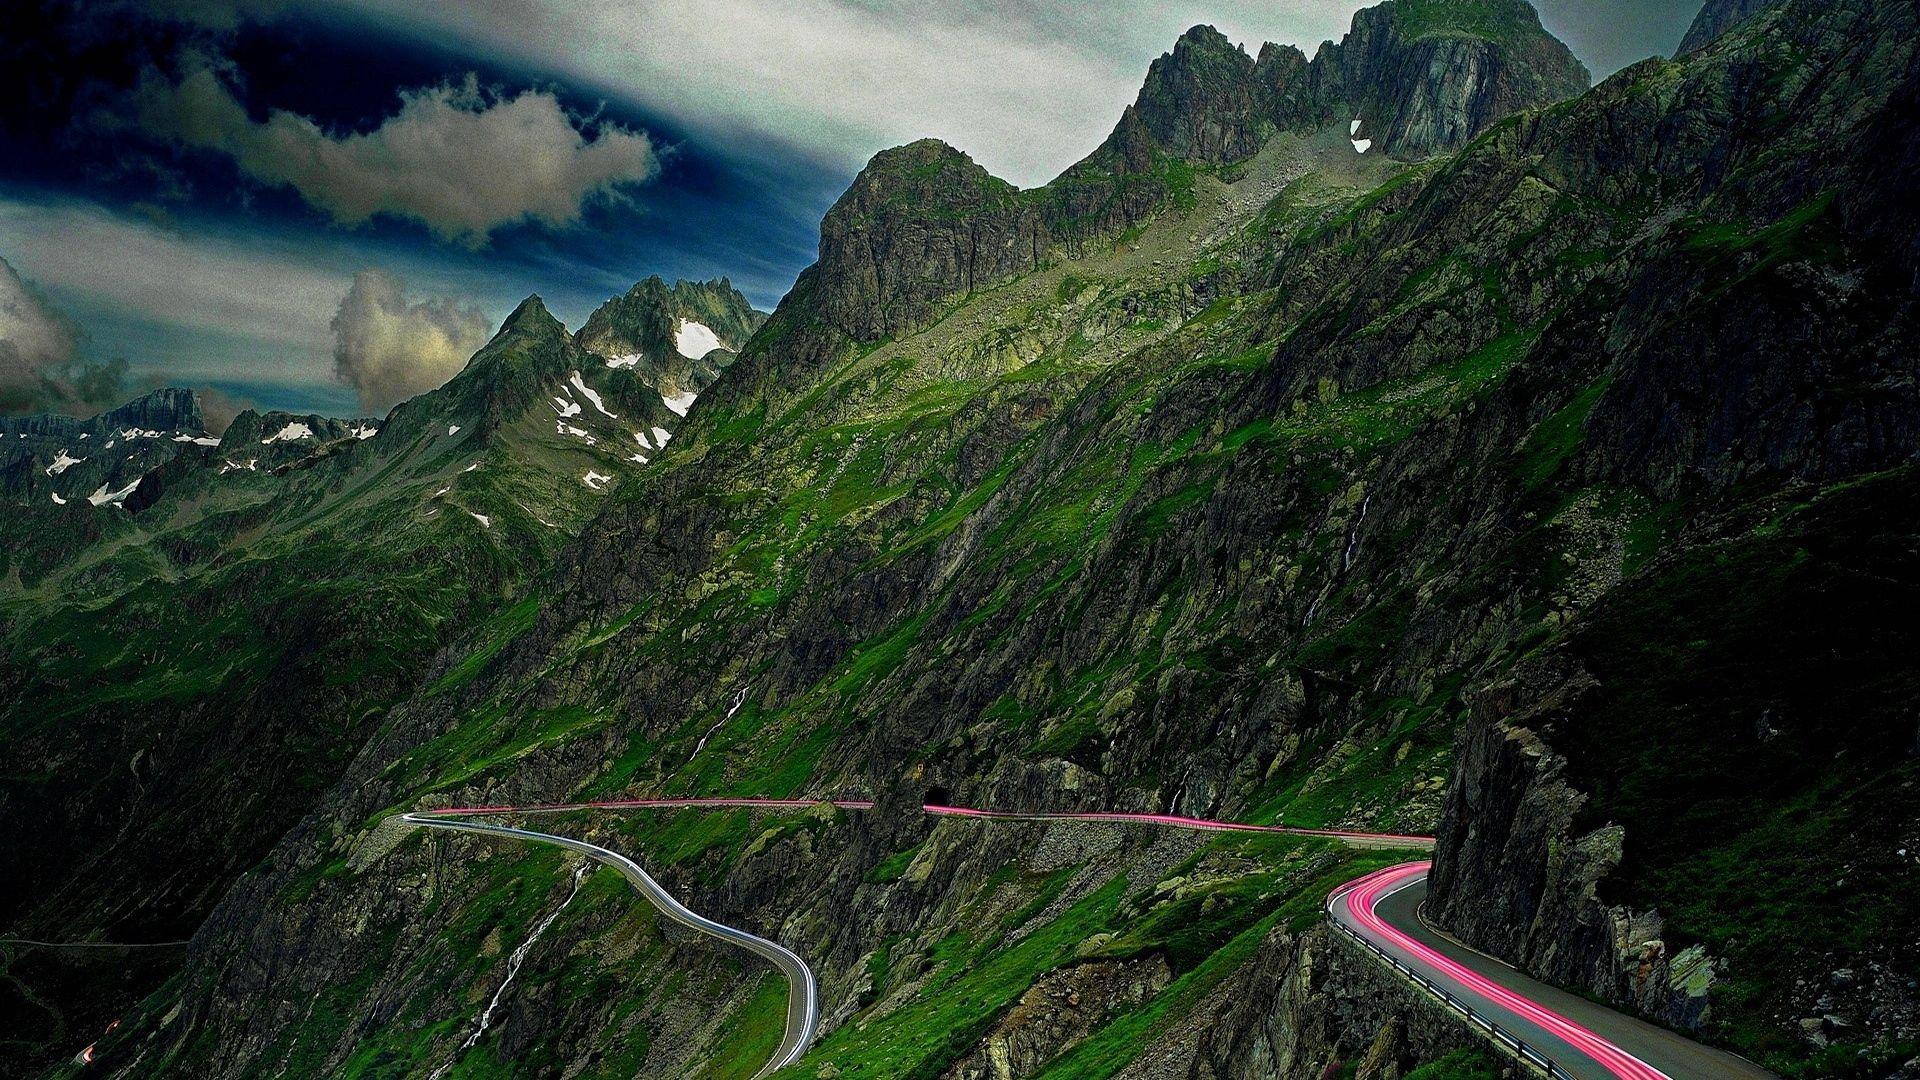 146851 free wallpaper 480x800 for phone, download images Landscape, Nature, Sky, Mountains, Road, Asphalt, Serpentine 480x800 for mobile